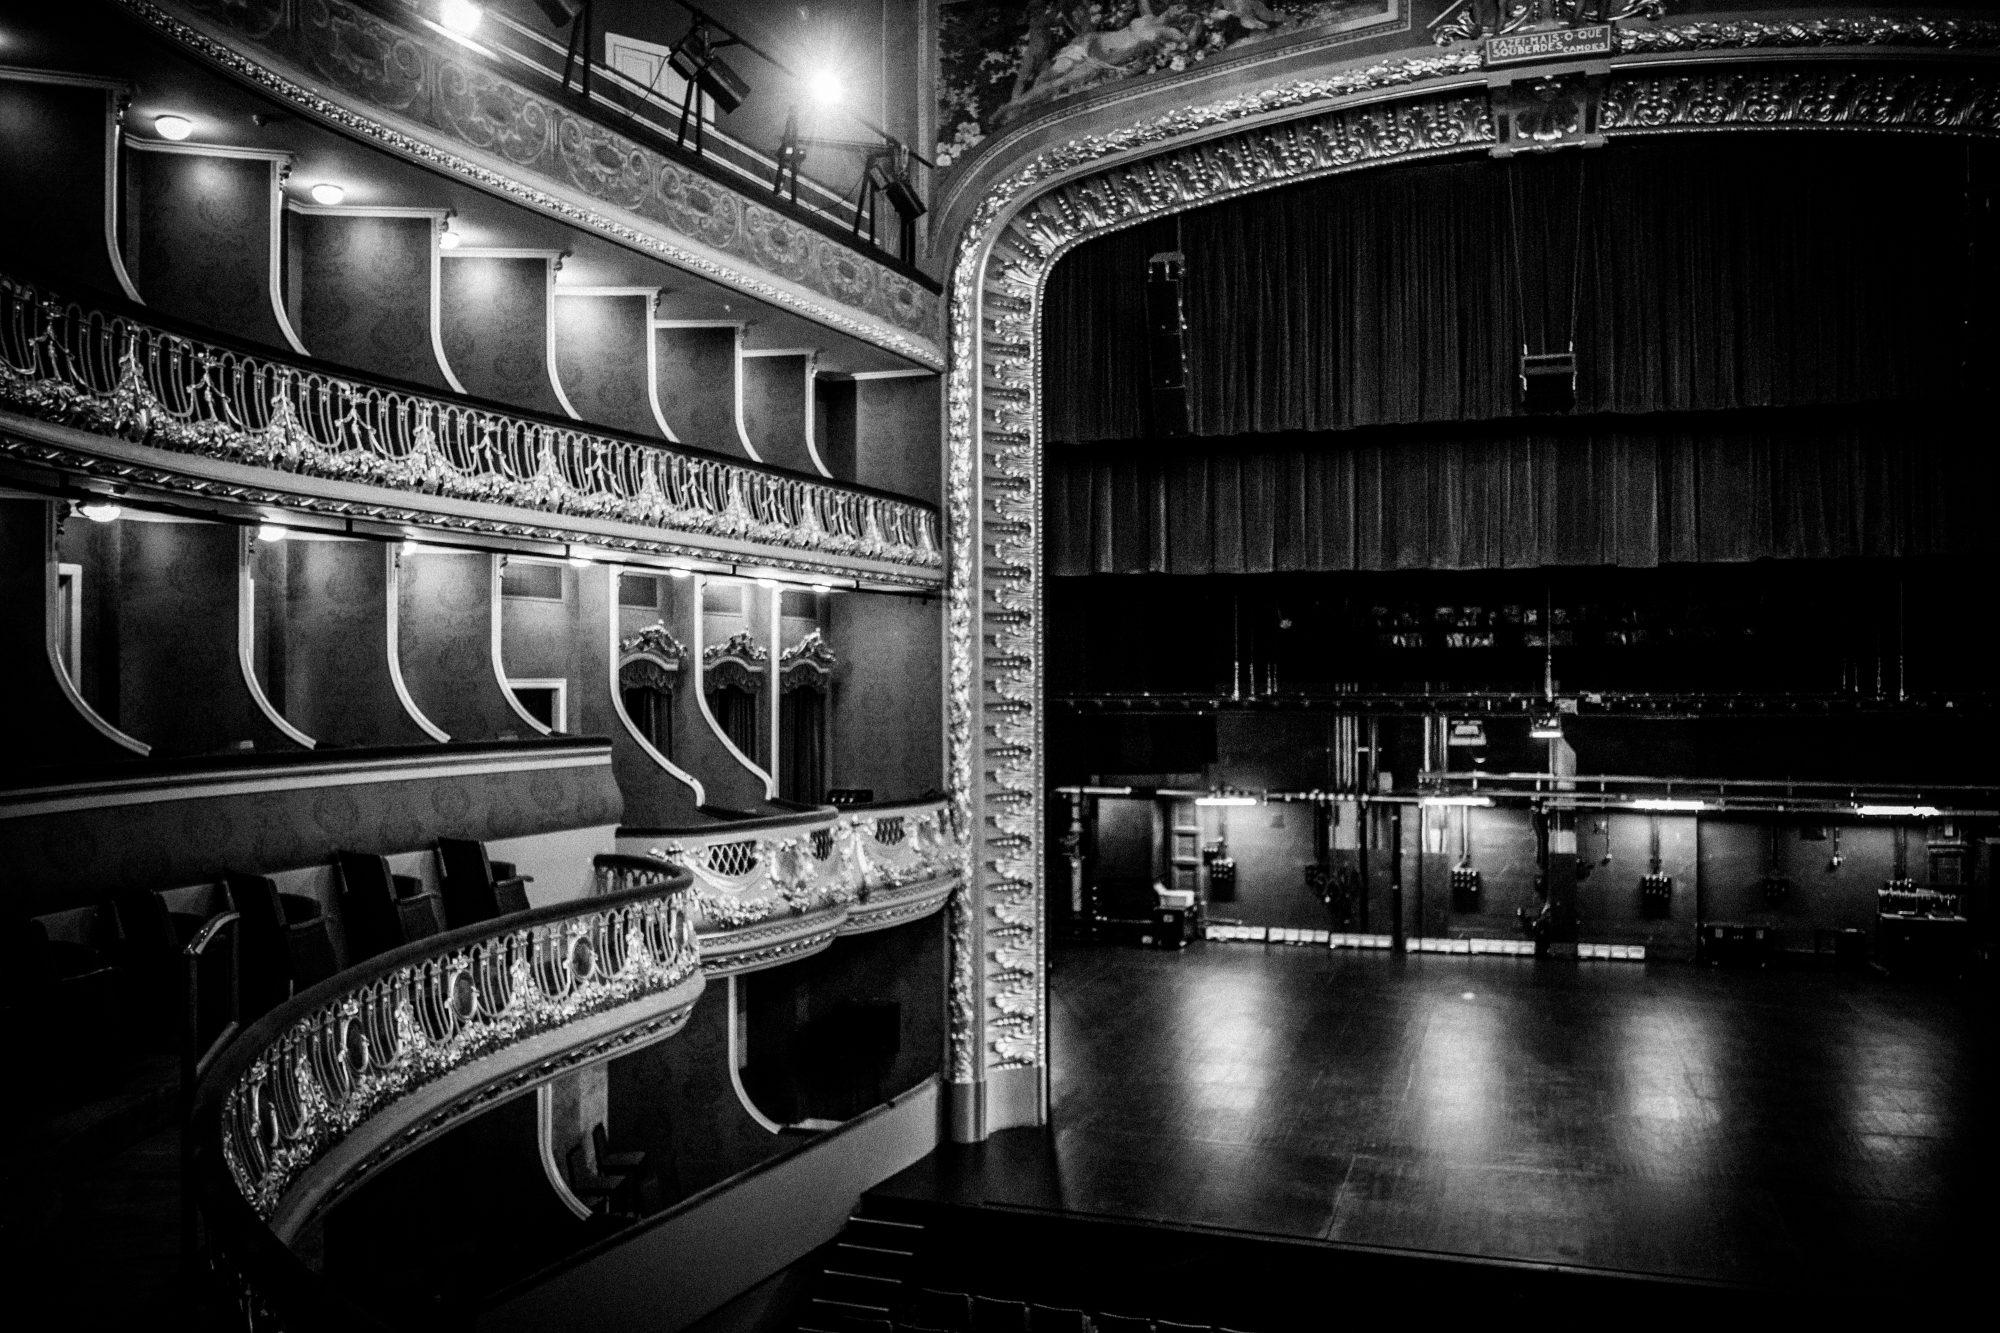 Teatro São Luiz ©Estelle Valente